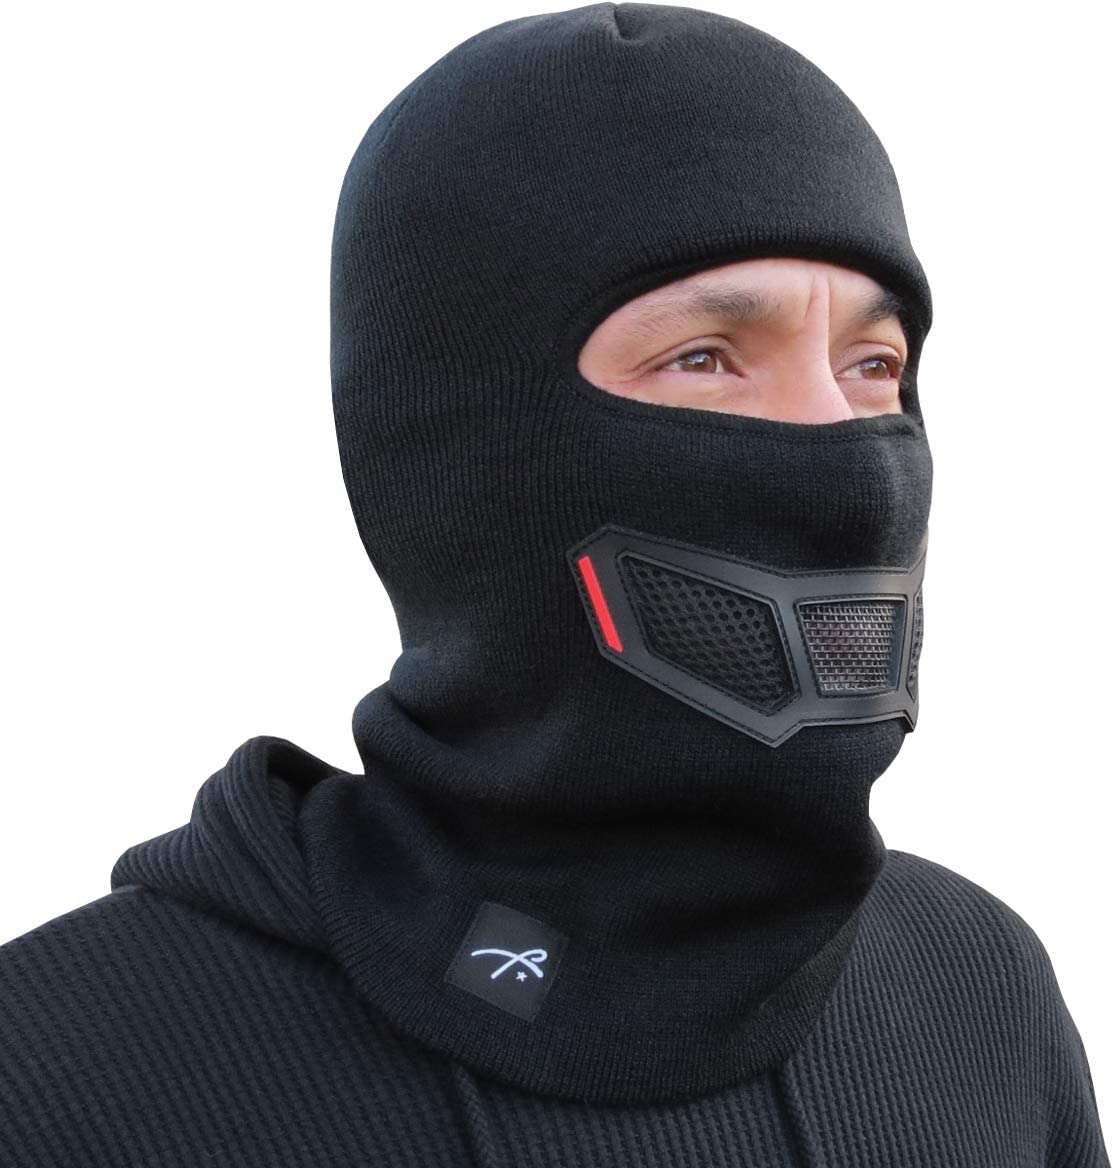 Grace Folly Knit Balaclava Full Face Winter Ski Mask with Vented Mouthpiece